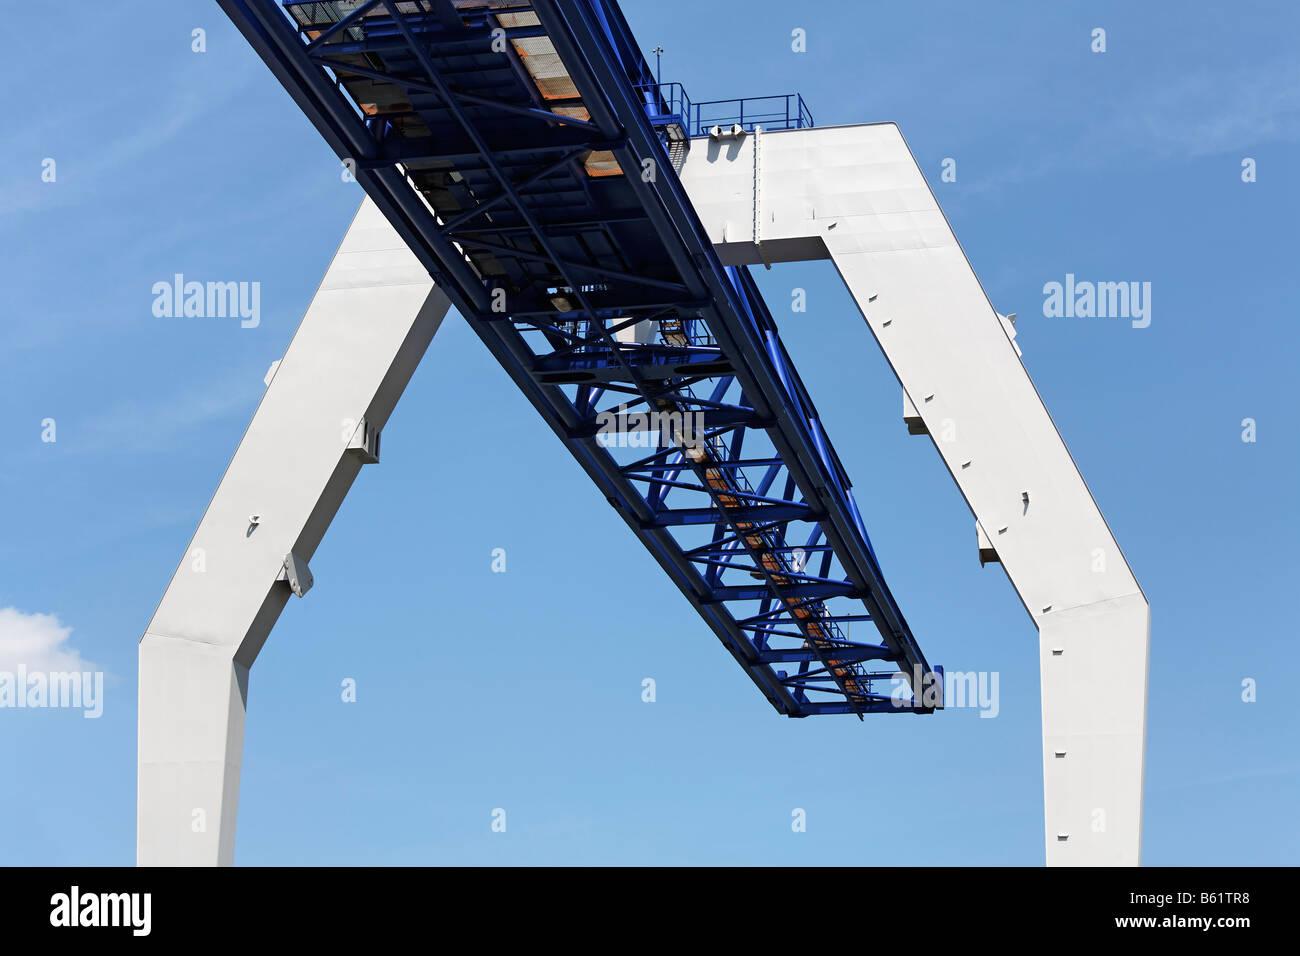 Bridge construction of a modern crane, Krefeld-Uerdingen, North Rhine-Westphalia, Germany, Europe - Stock Image